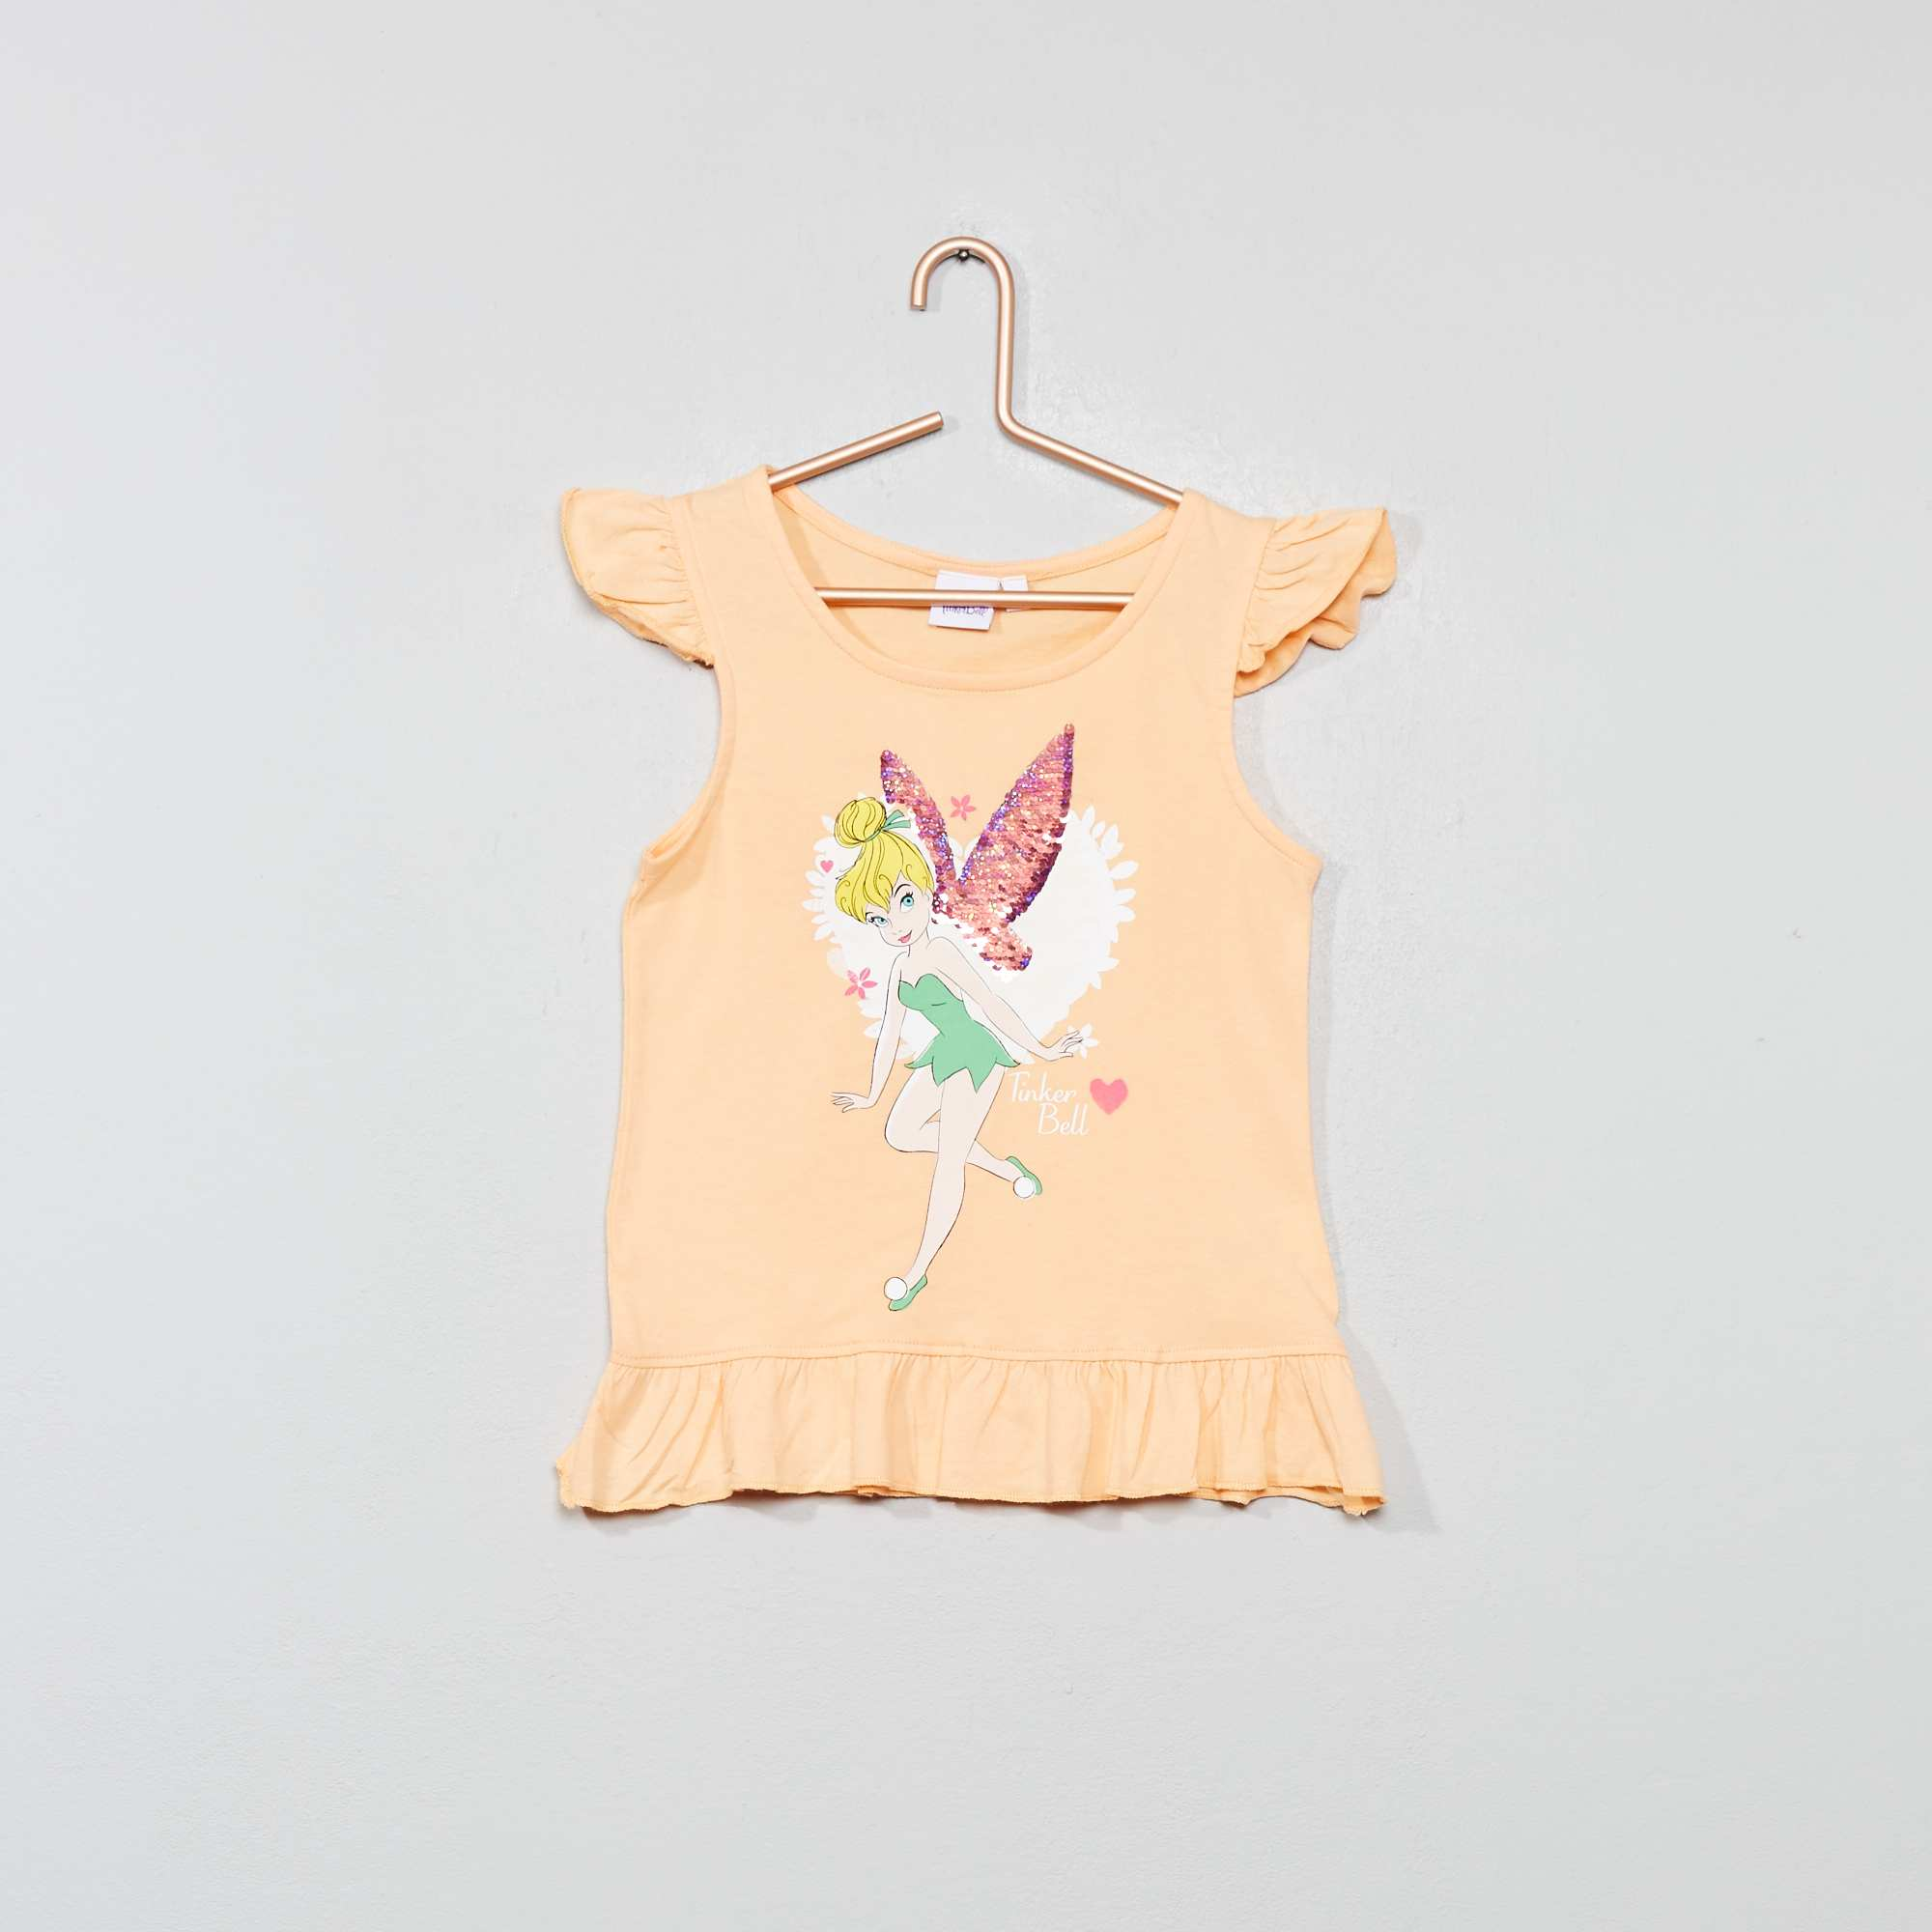 203747b84 Camiseta sin mangas con lentejuelas reversibles 'Campanilla' NARANJA Chica.  Loading zoom